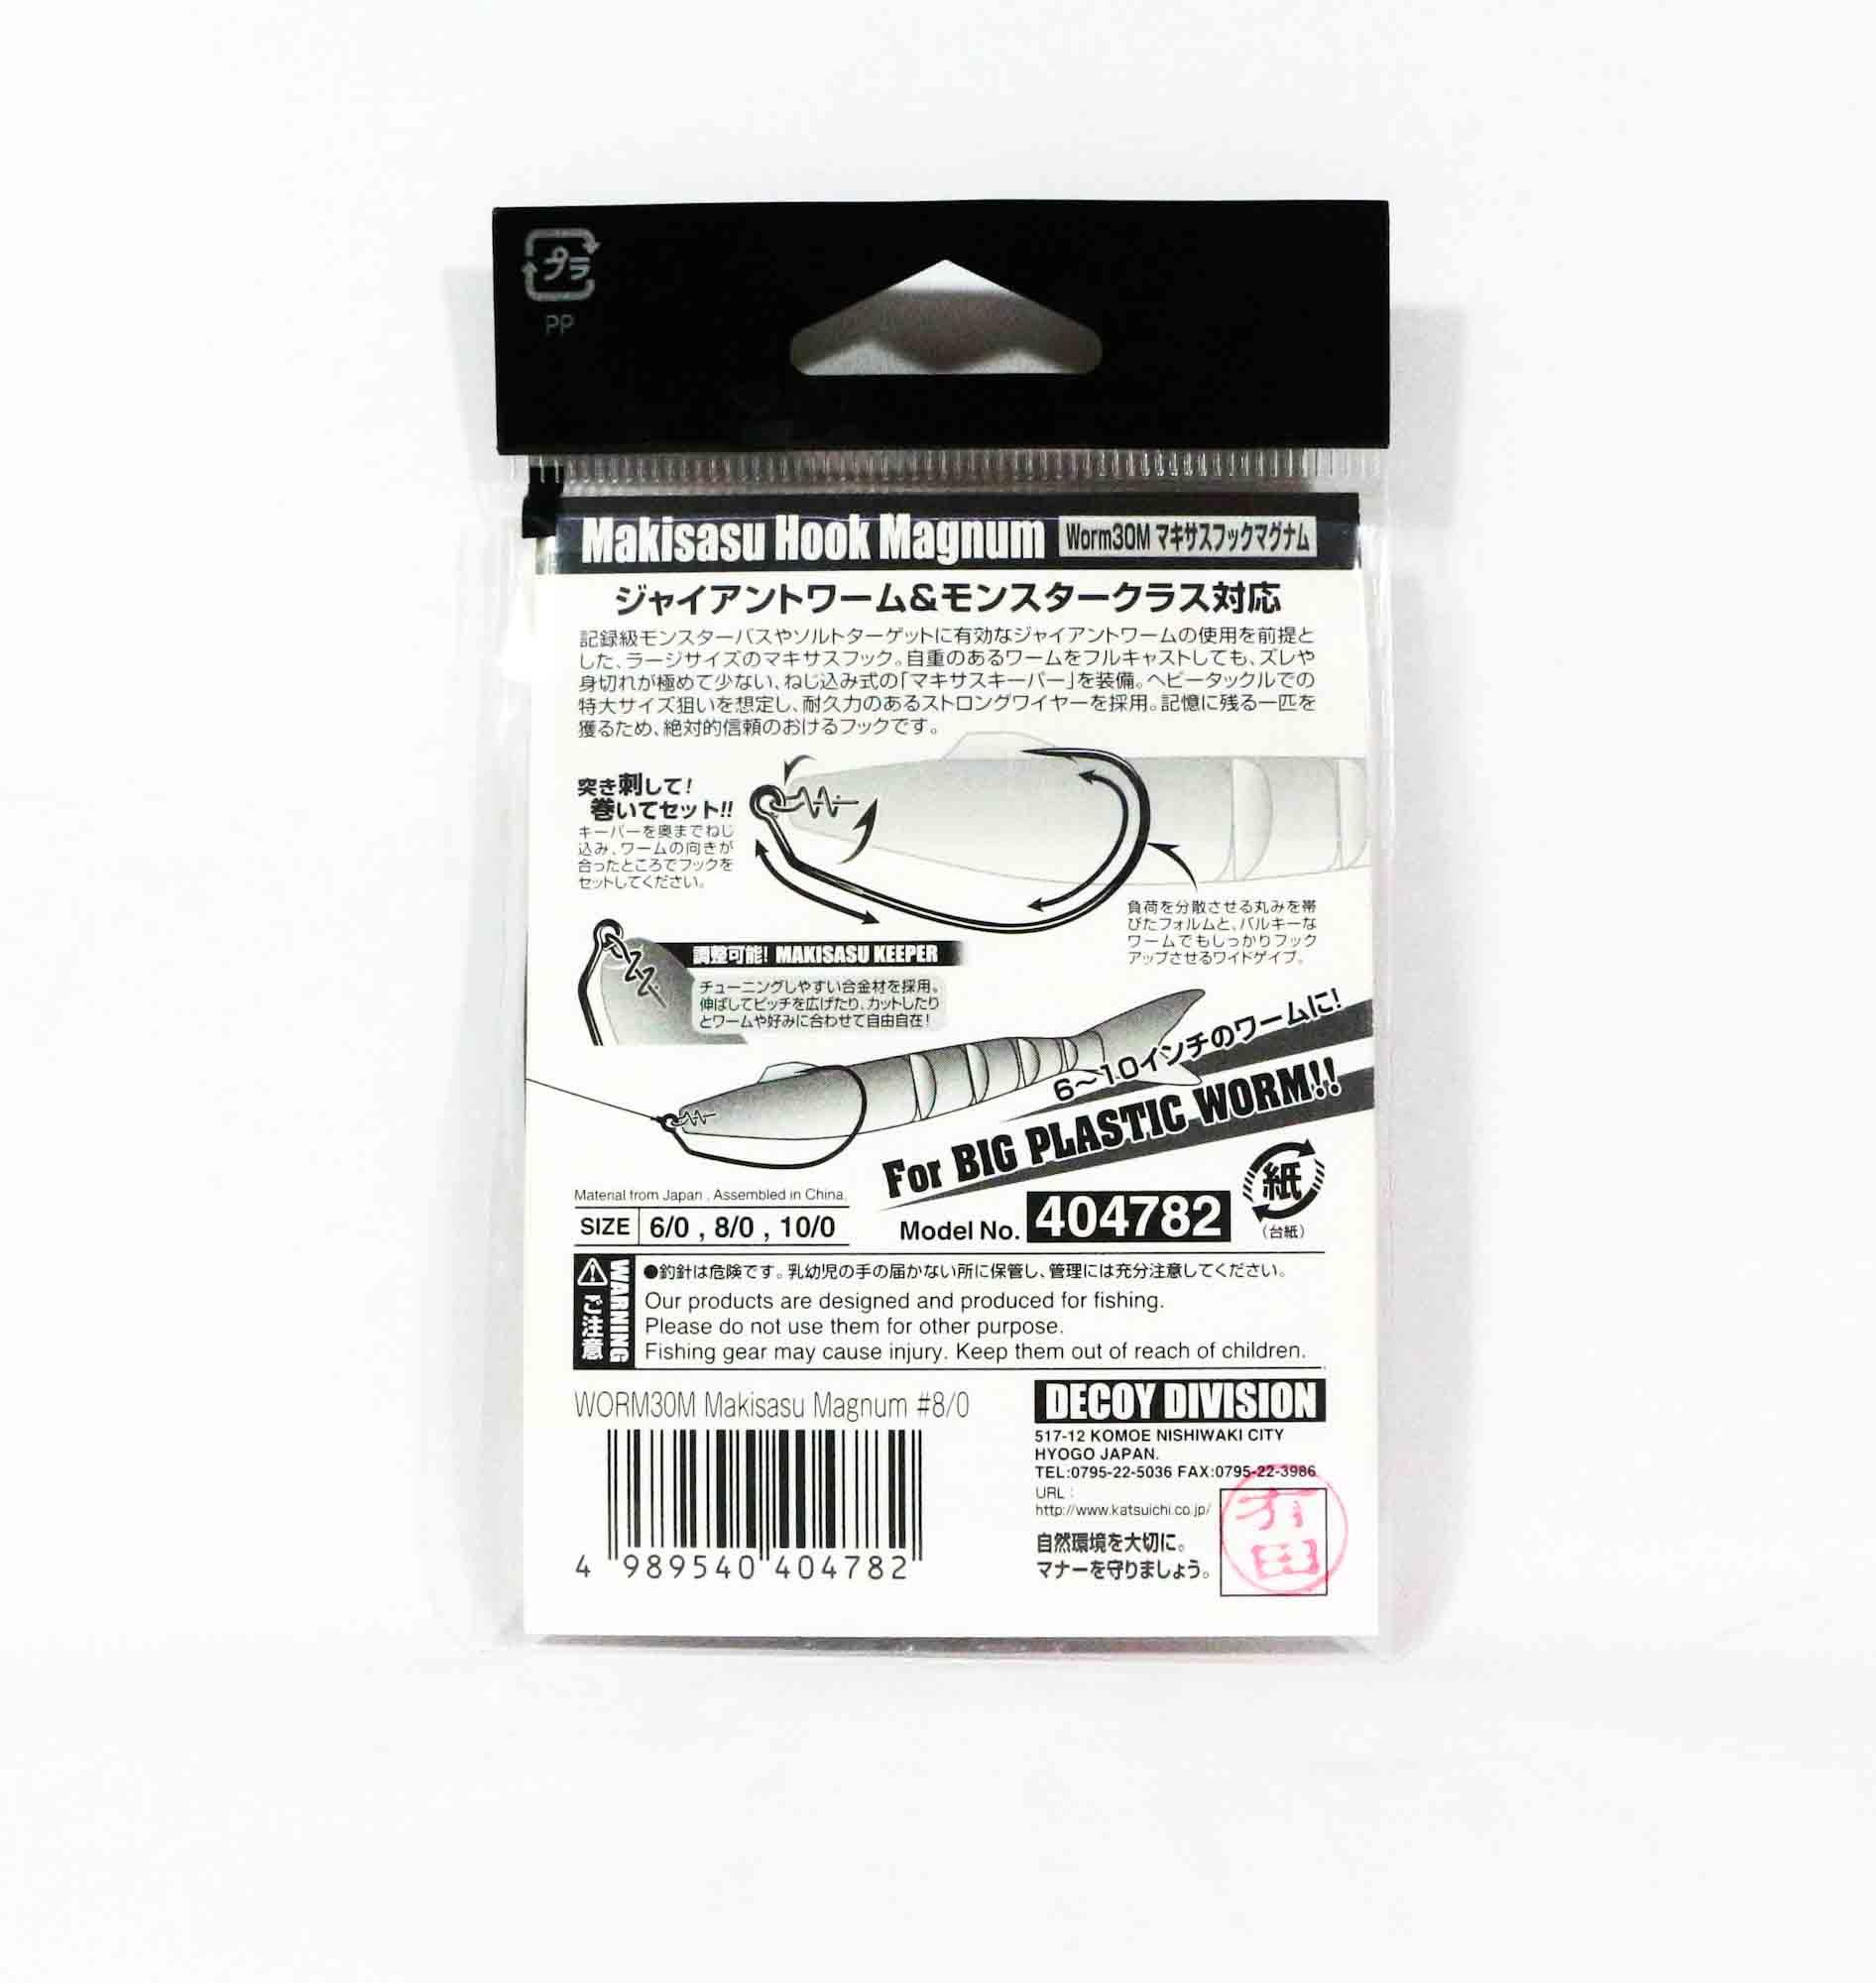 9035 Decoy Worm 30 Makisasu Worm Hooks Size 5//0